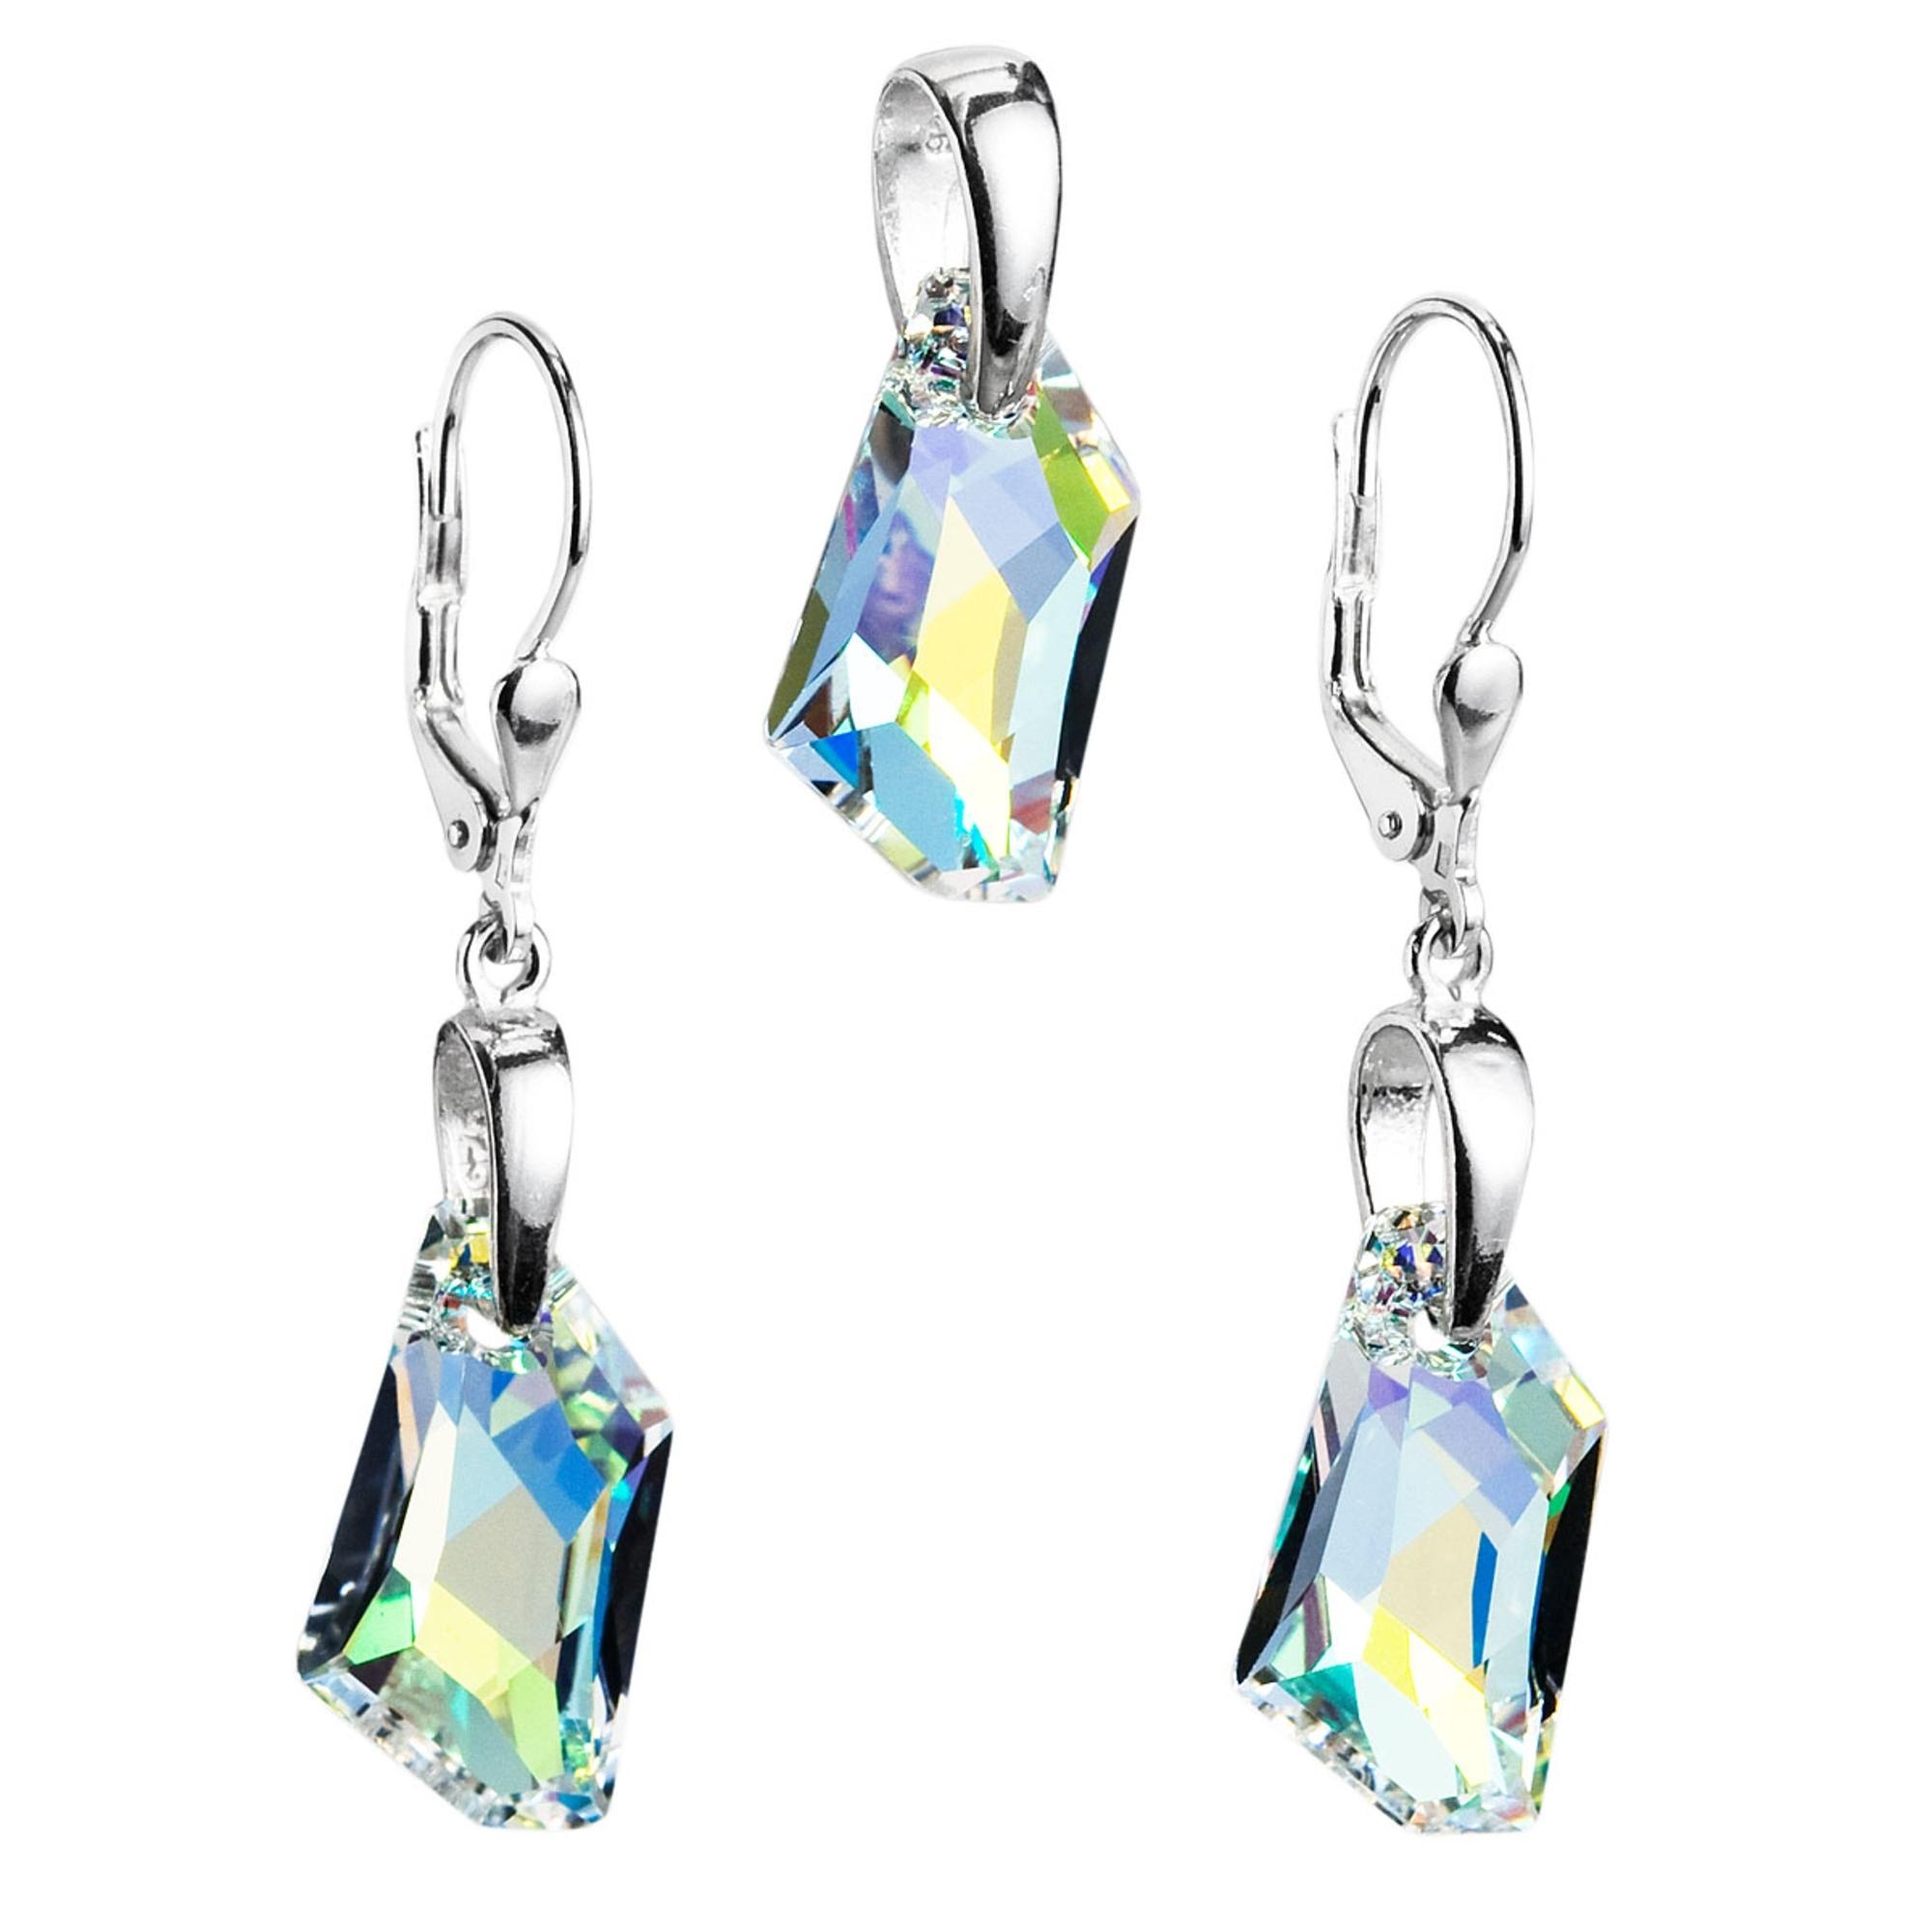 Sada šperků s kameny Crystals from Swarovski® AB EG3026-AB